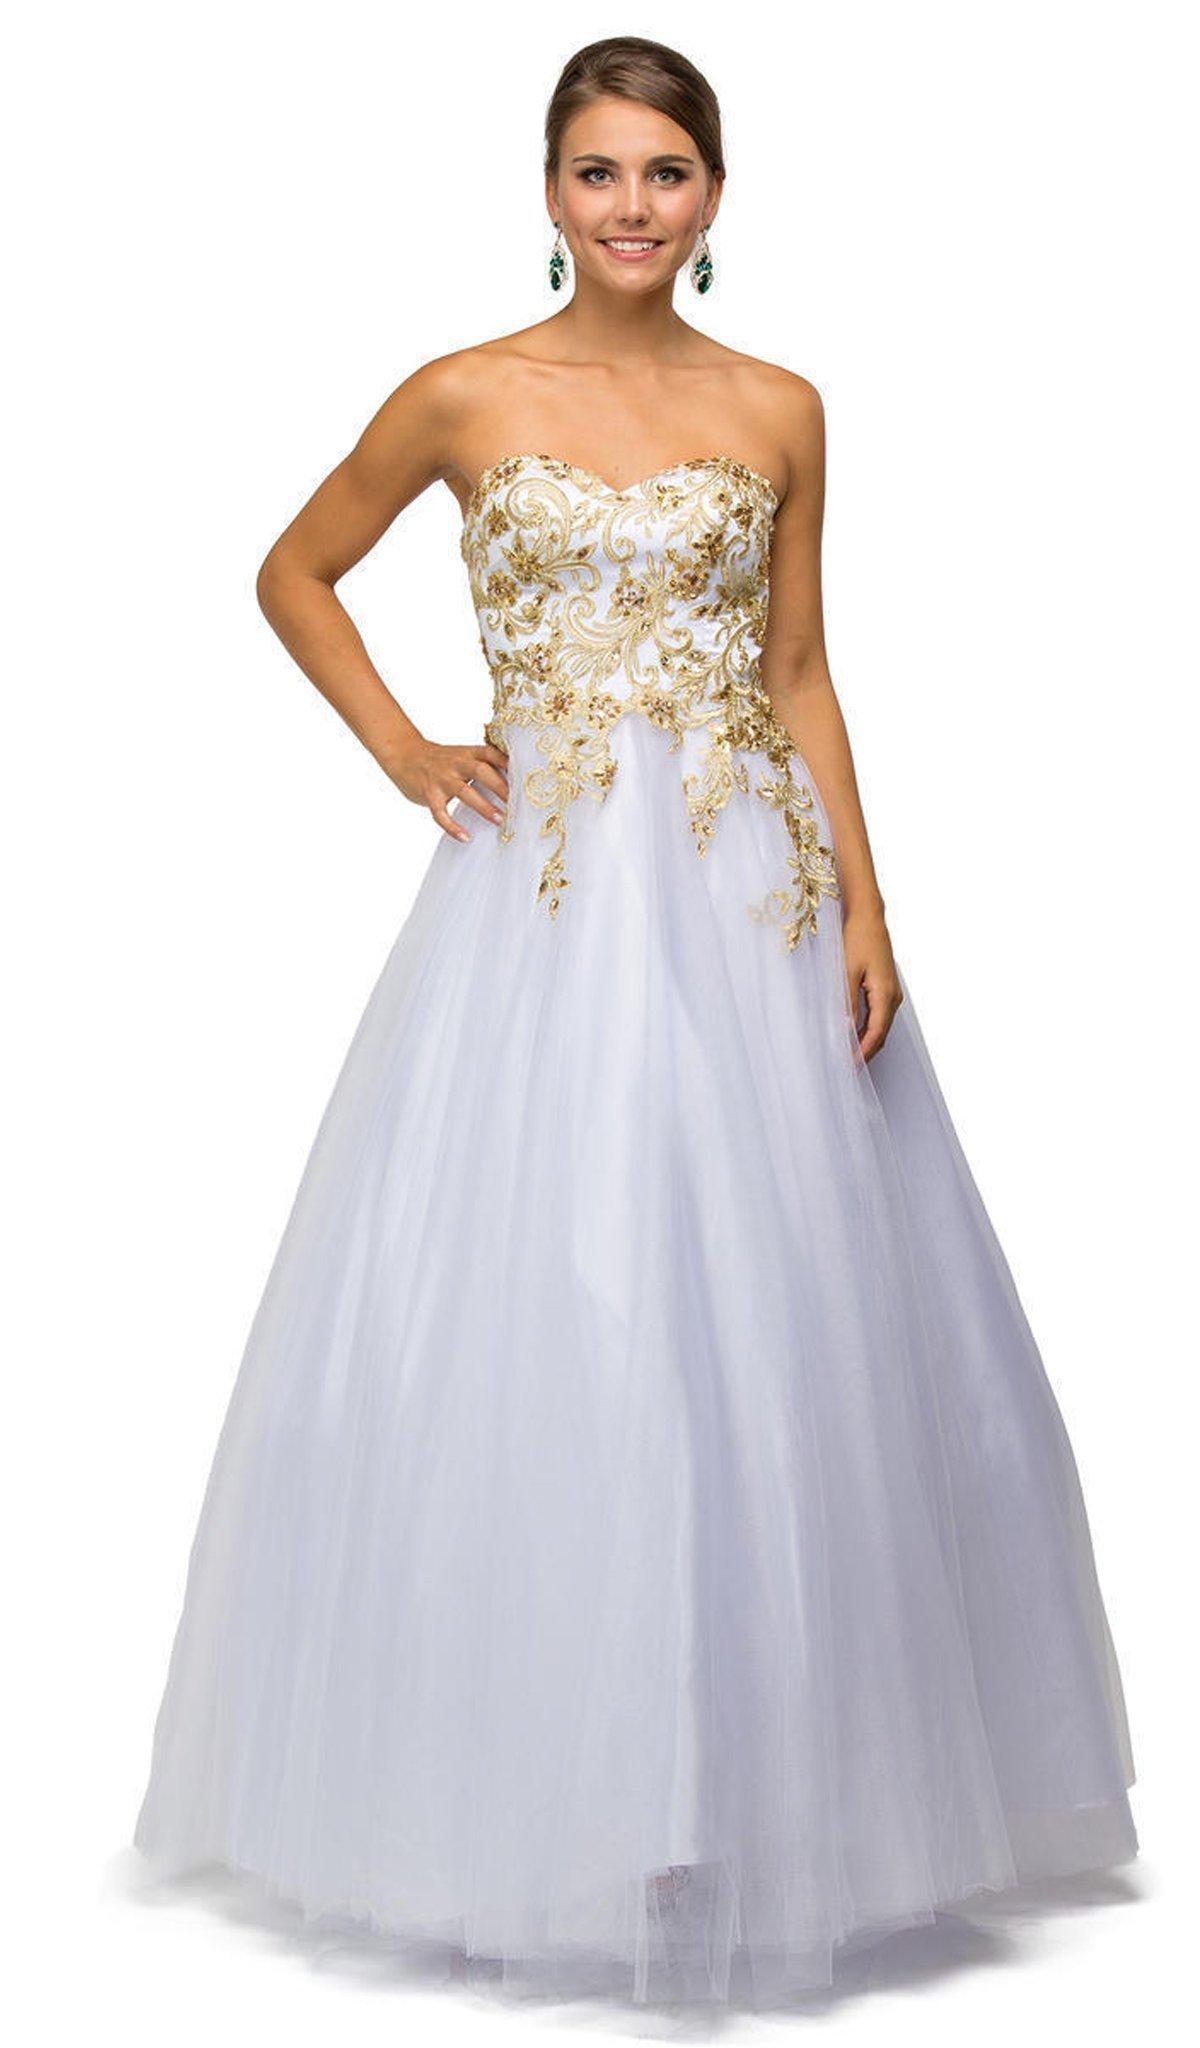 Dancing Queen - 9042 Gilded Strapless Evening Ballgown